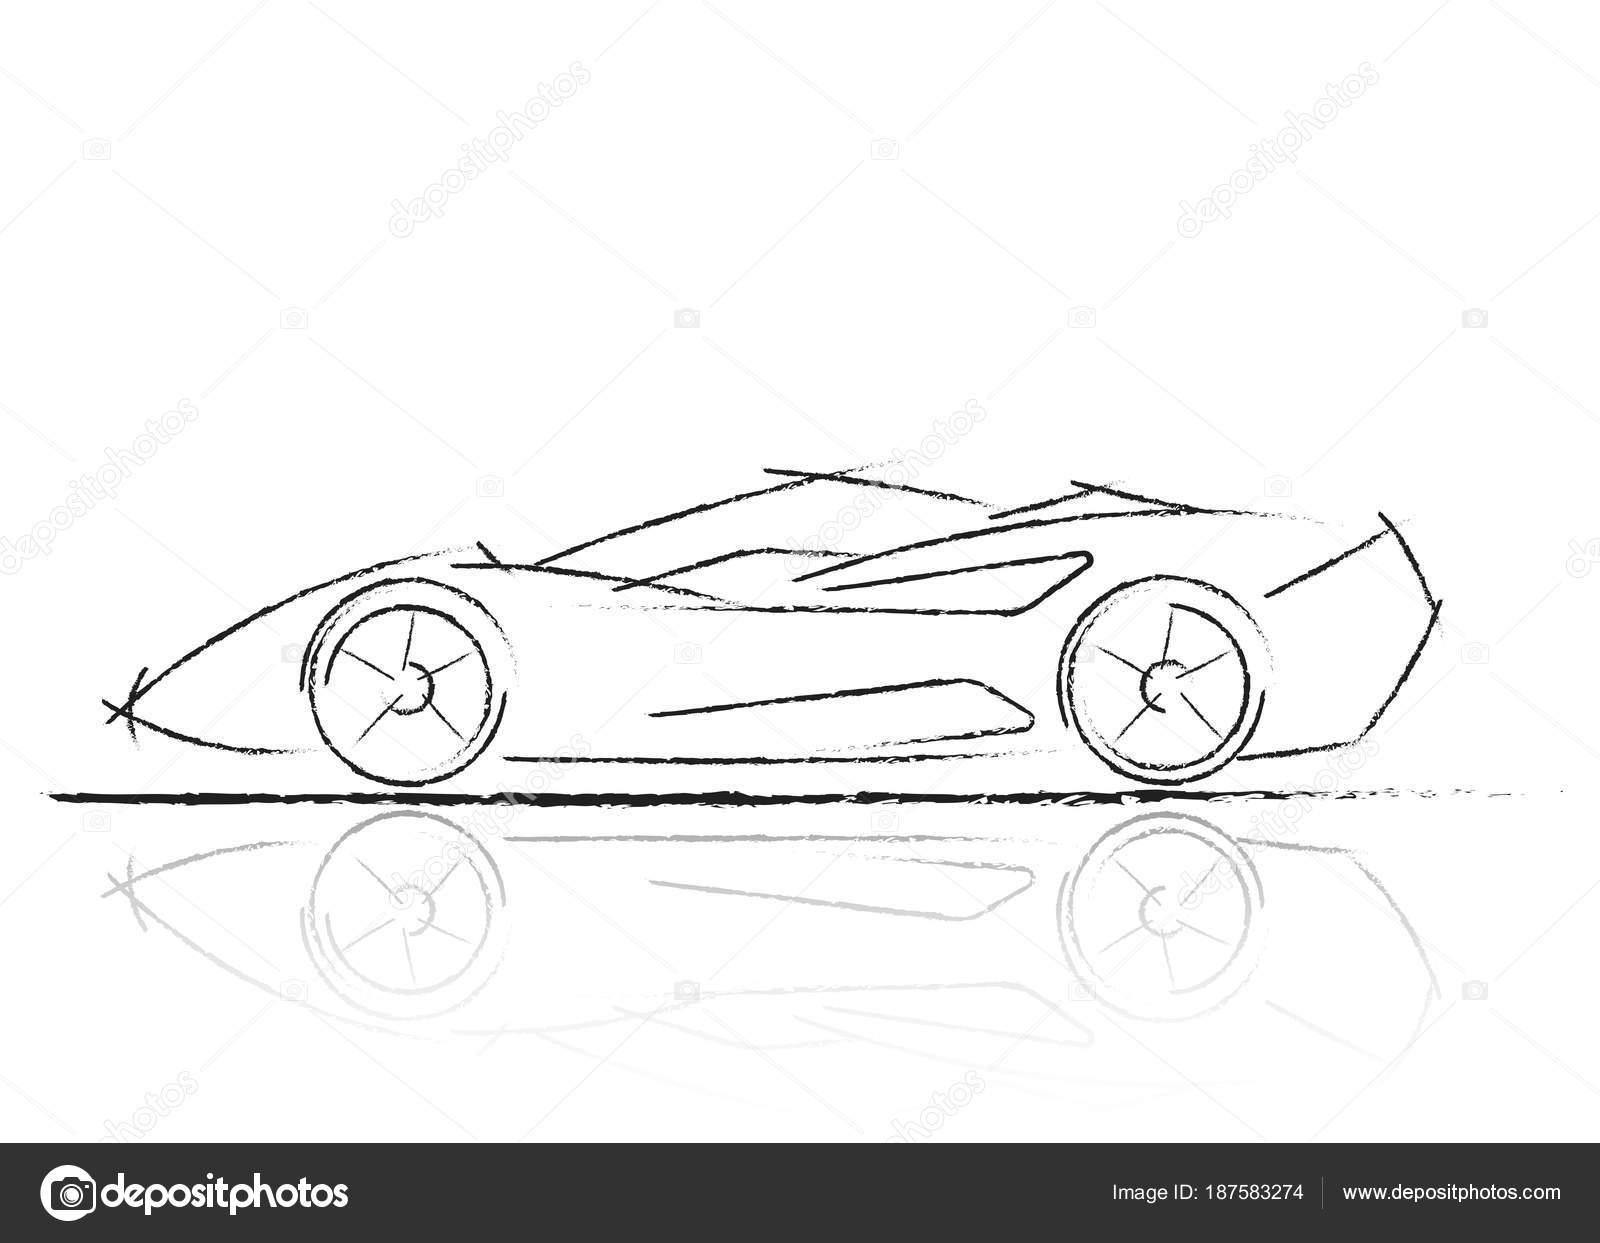 ᐈ Ferrari Logo Black And White Stock Images Royalty Free Ferrari Backgrounds Download On Depositphotos